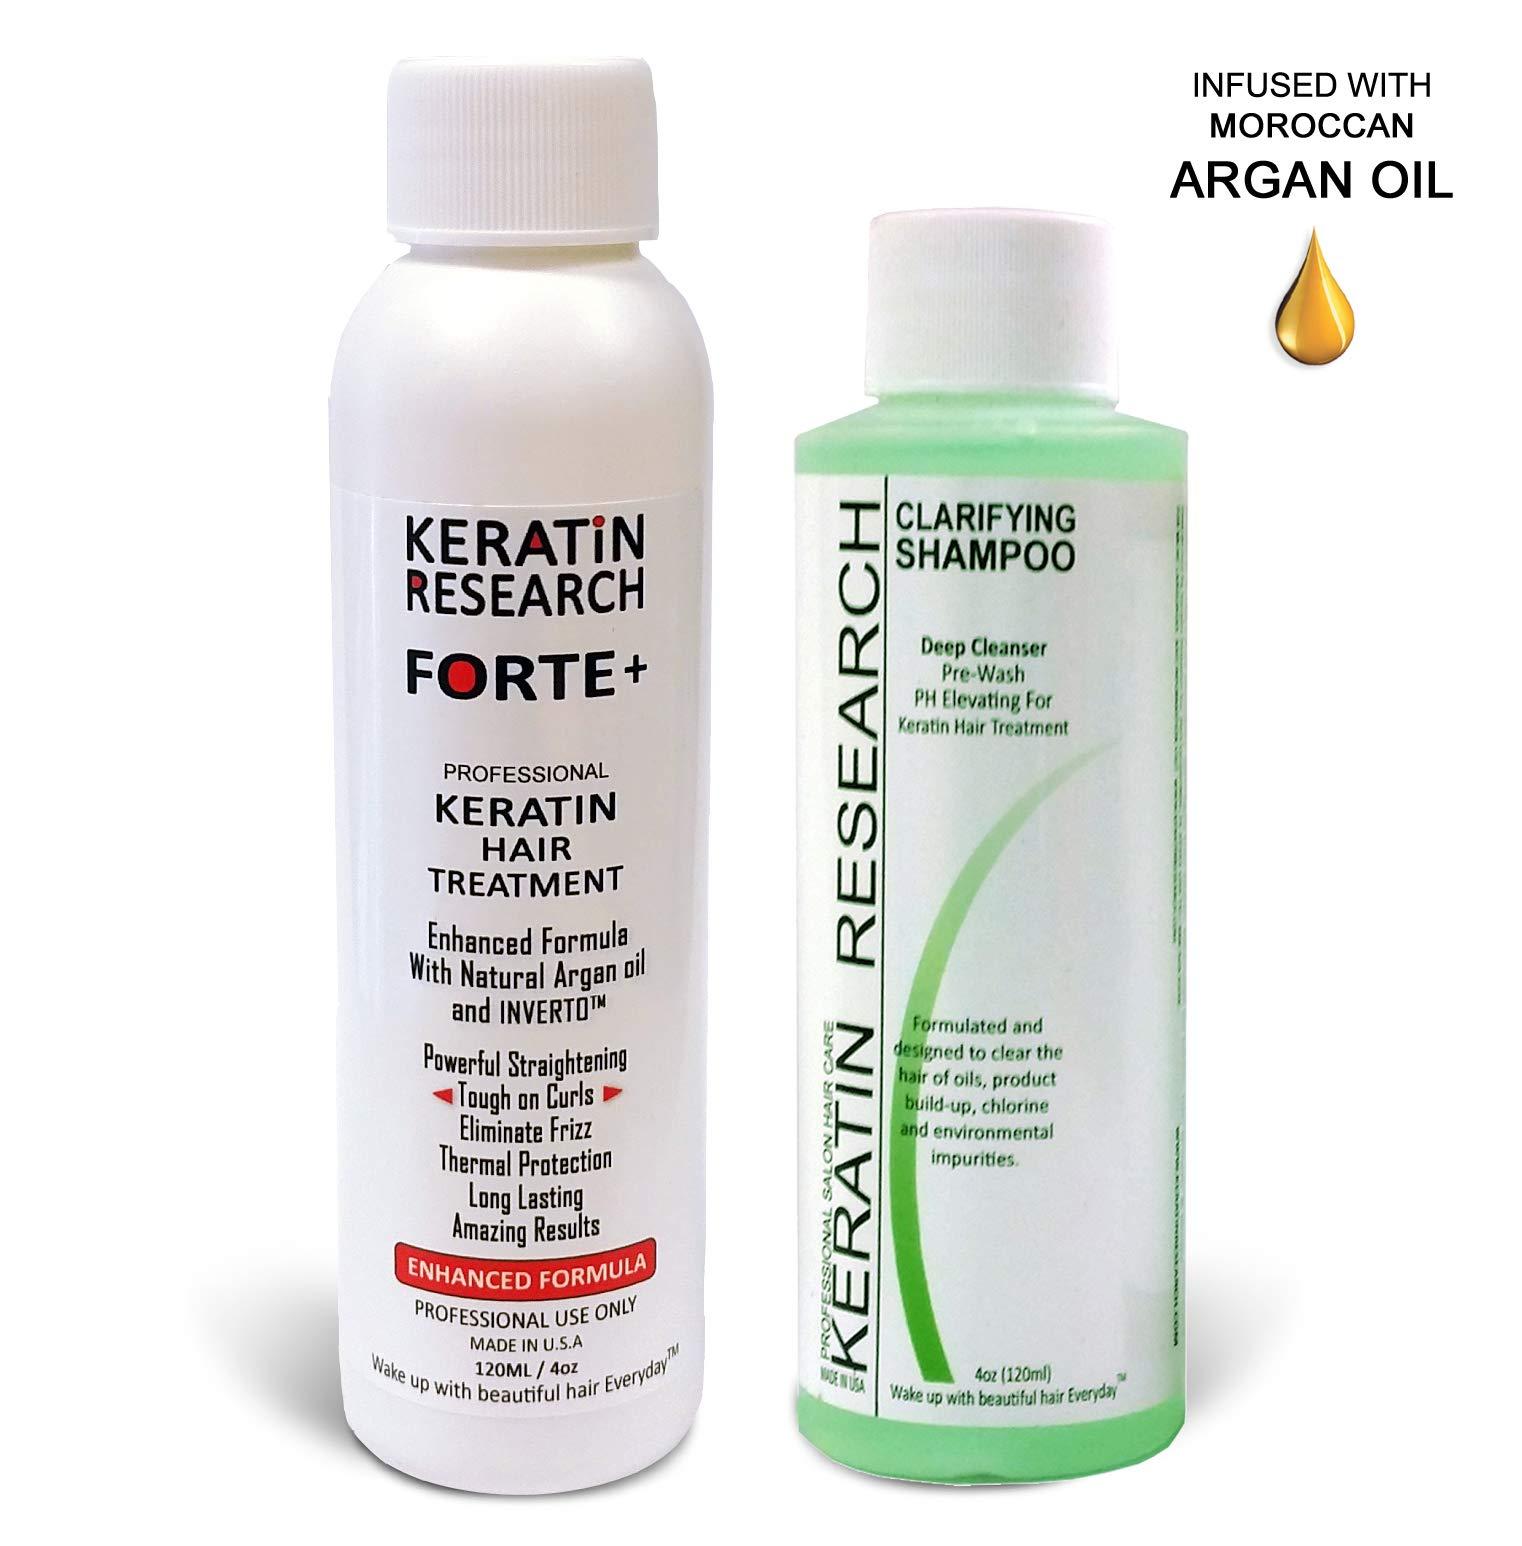 Keratin Forte Keratin Brazilian Keratin Hair Blowout Treatment Extra Strength 120ml with Clarifying Shampoo Enhanced Formula for Curly Hair By Keratin Research Queratina Keratina Brasilera Forte